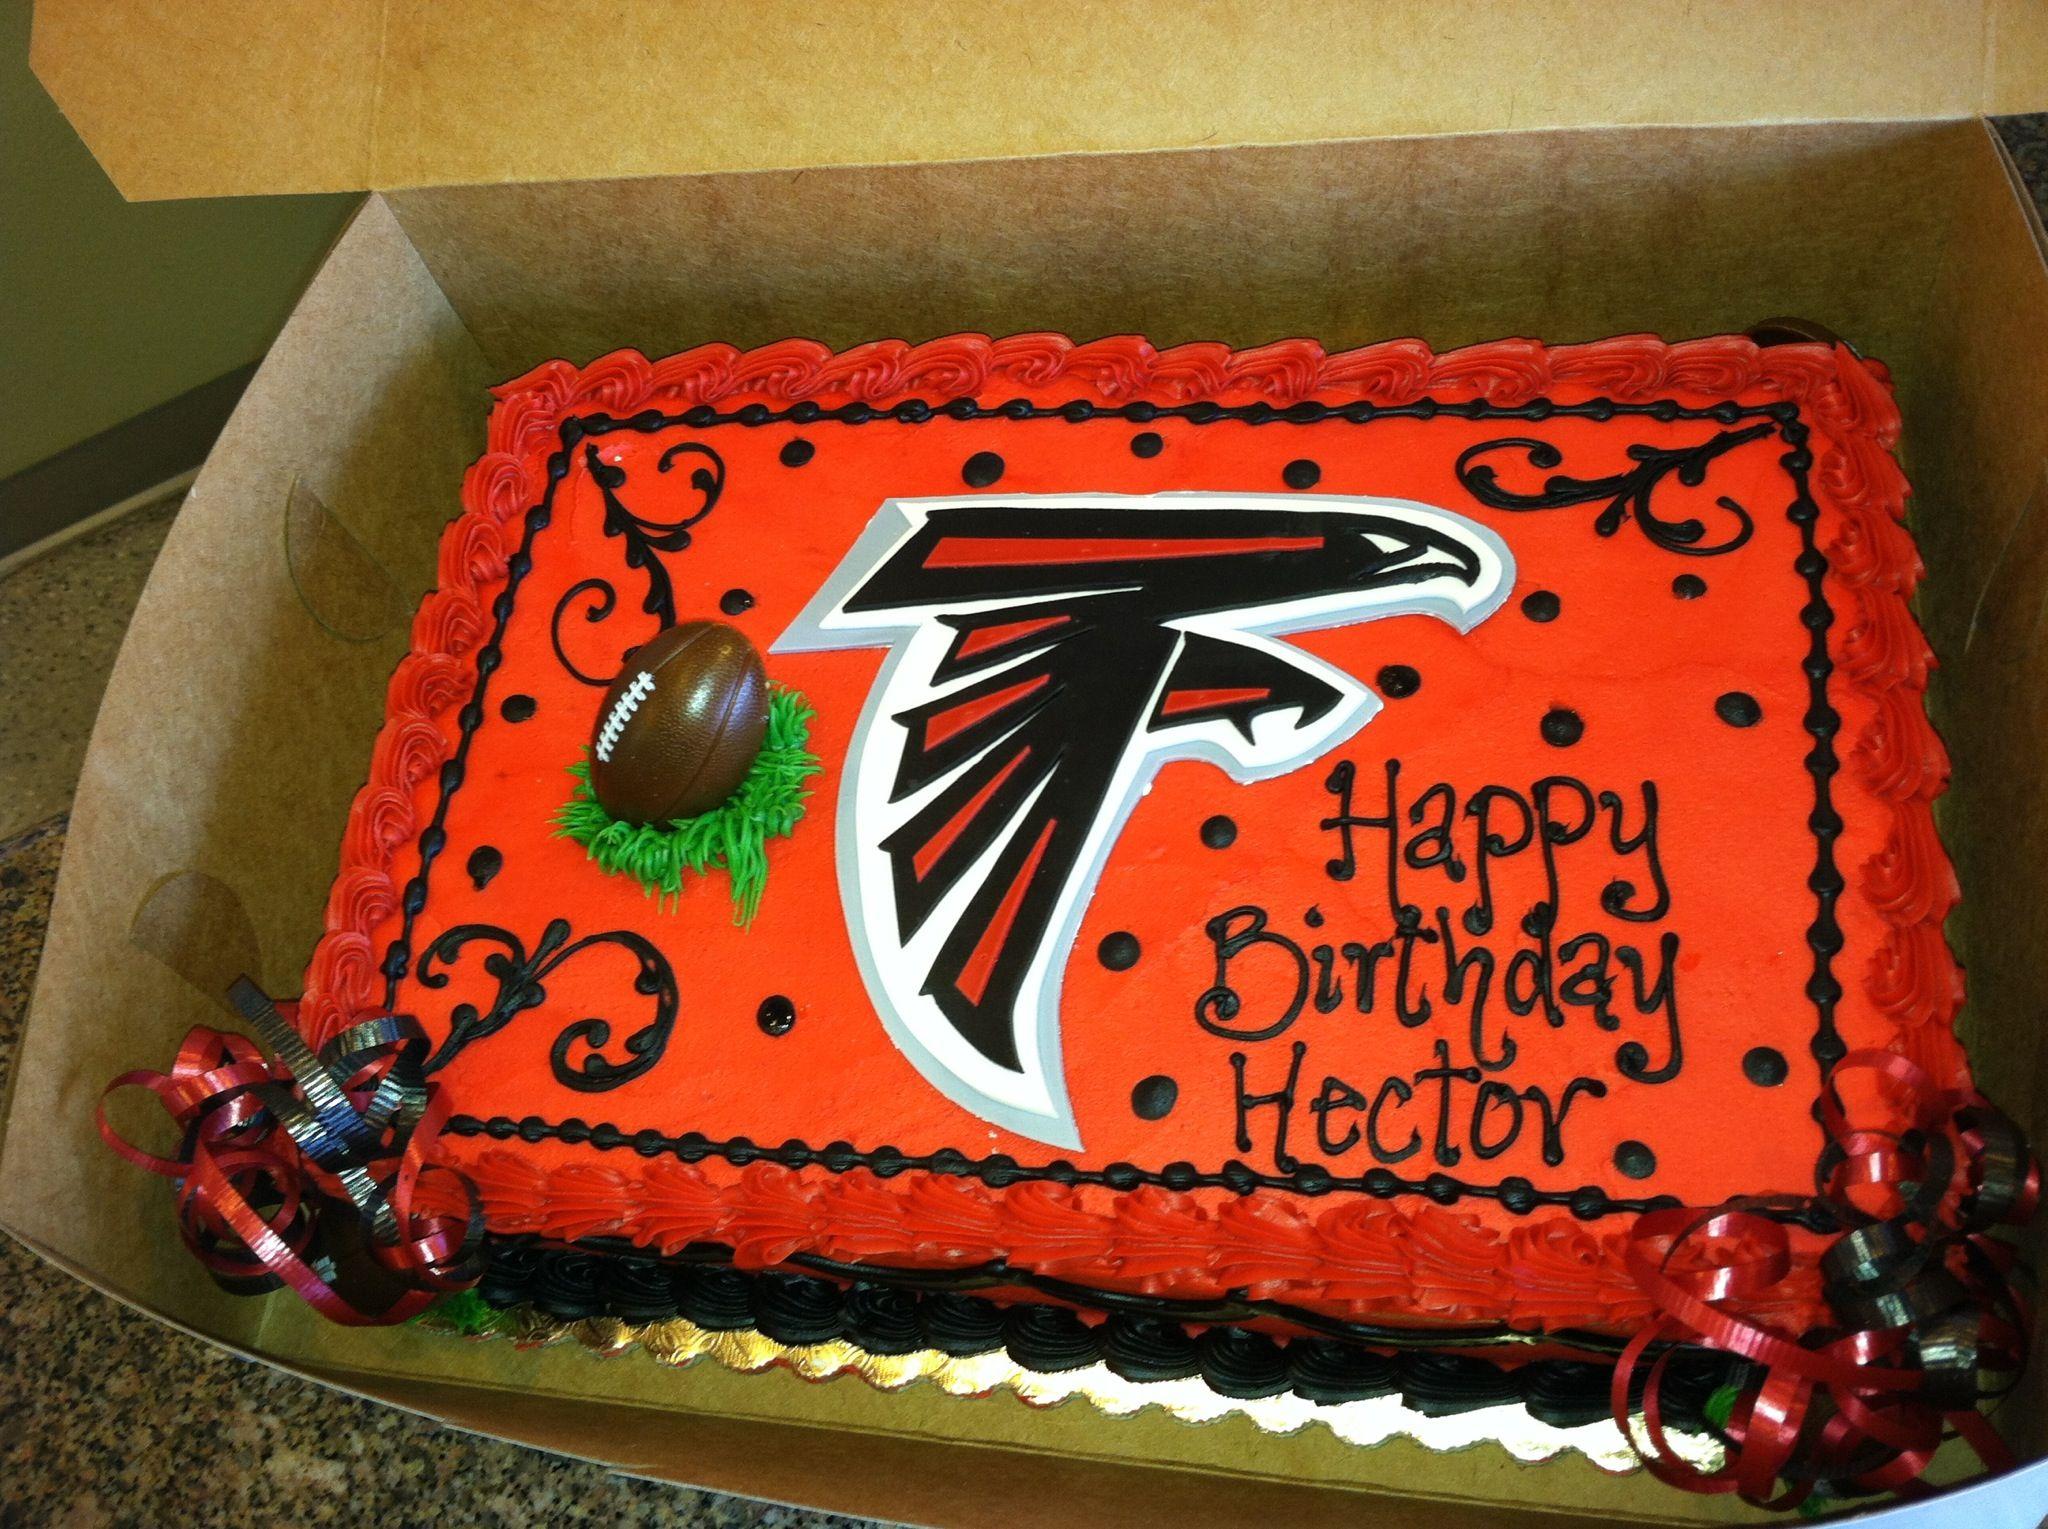 Atlanta Falcon Cake For Hector S Birthday Atlanta Falcons Birthday Atlanta Falcons Cake Falcons Cake